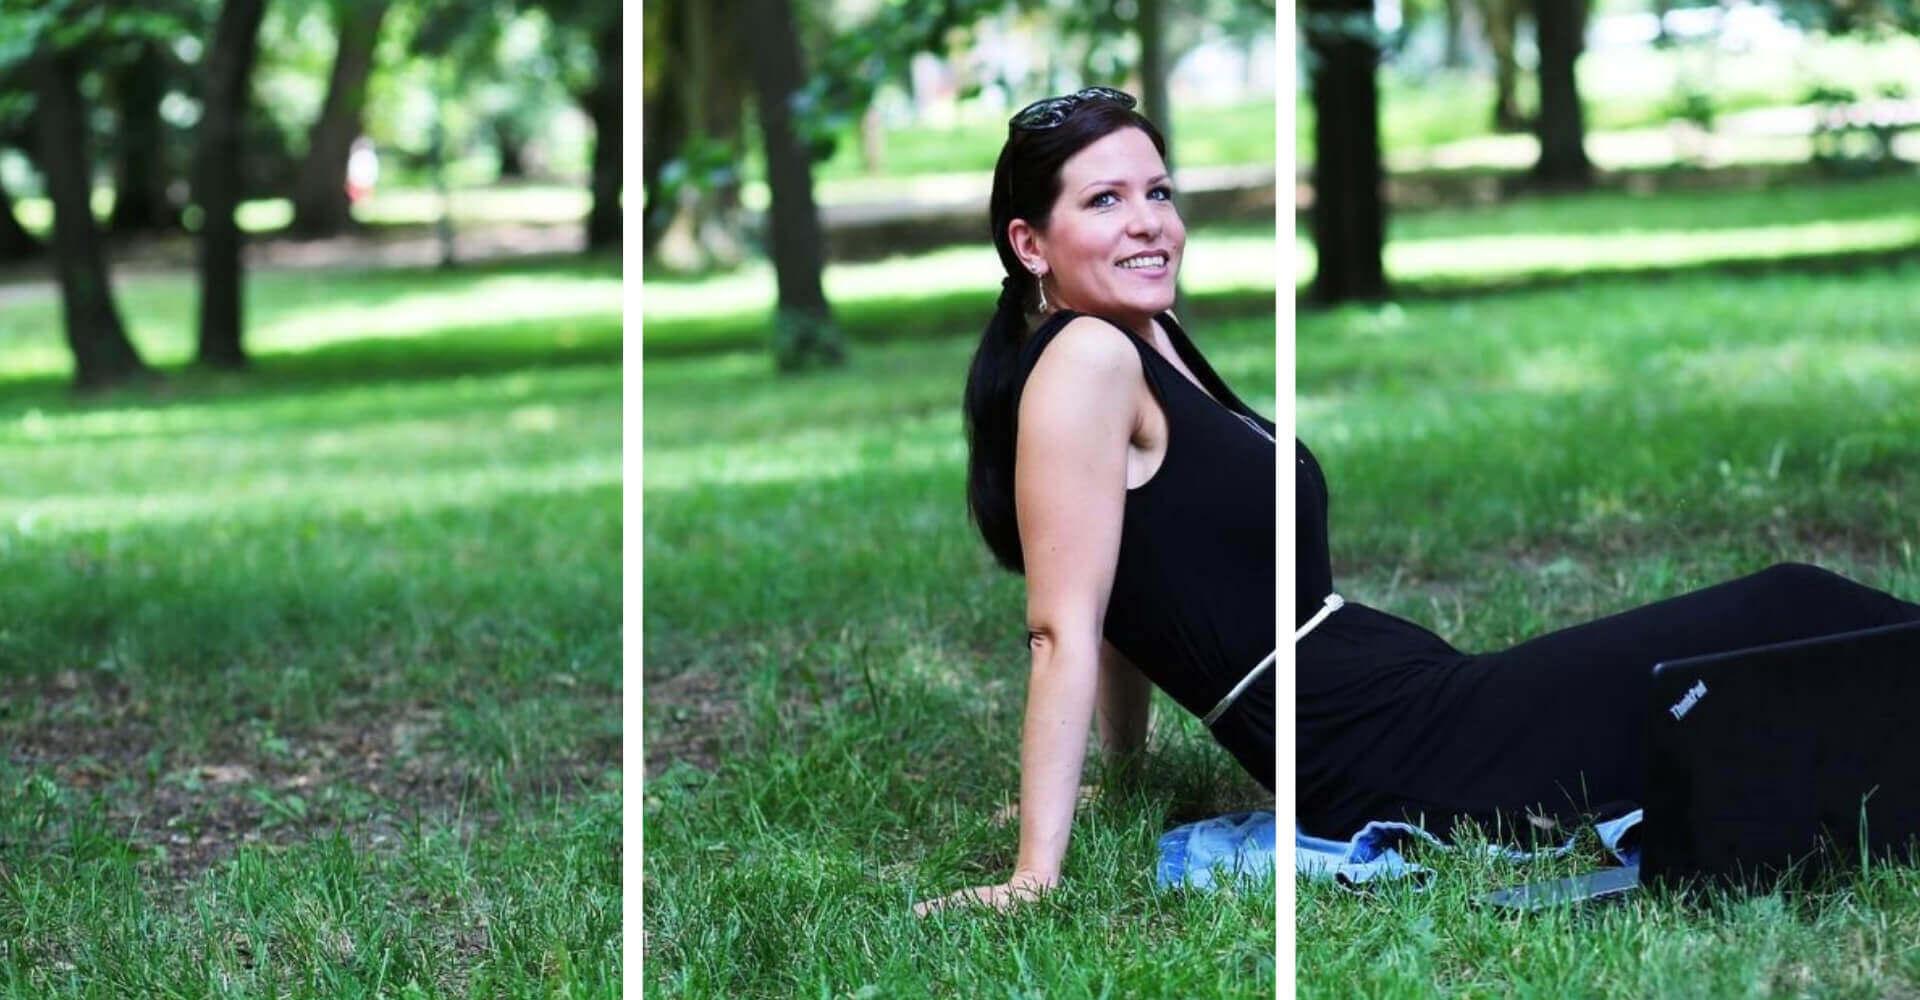 ludmila-hoosova-ako-zacat-podnikat-tvorba-web-stranok-1-re